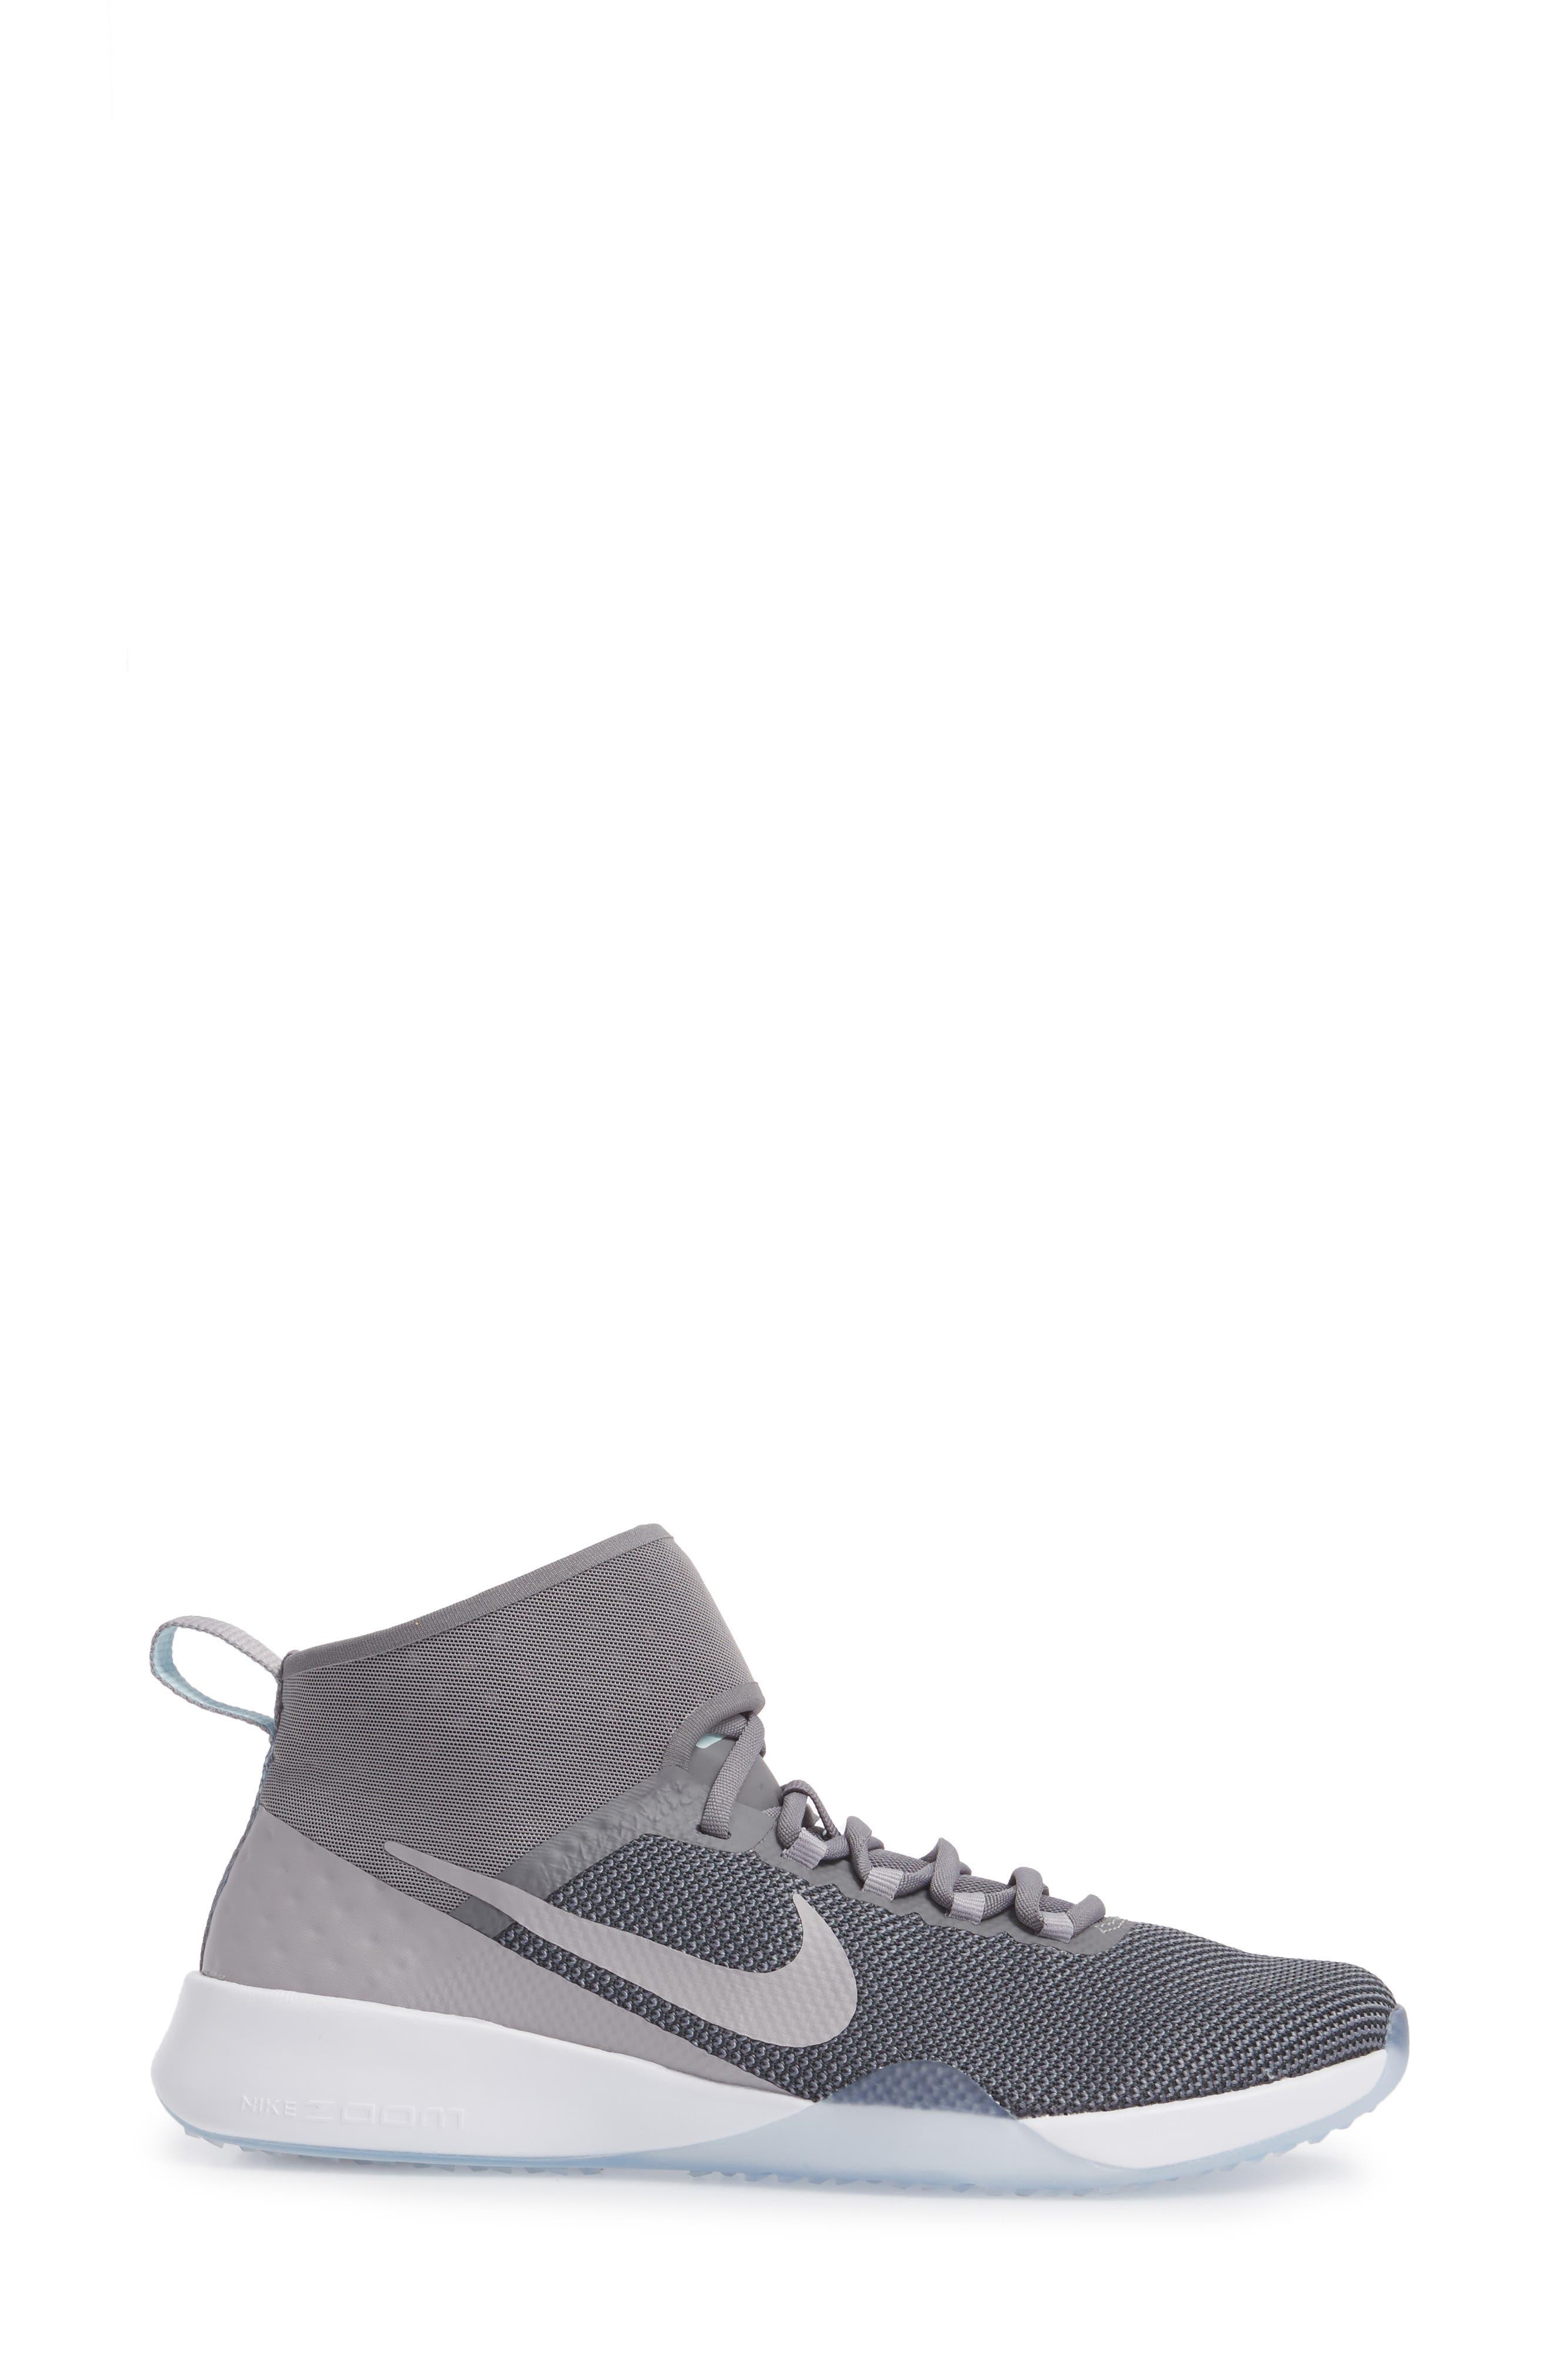 NIKE, NikeLab Air Zoom Strong 2 Training Shoe, Alternate thumbnail 3, color, 025